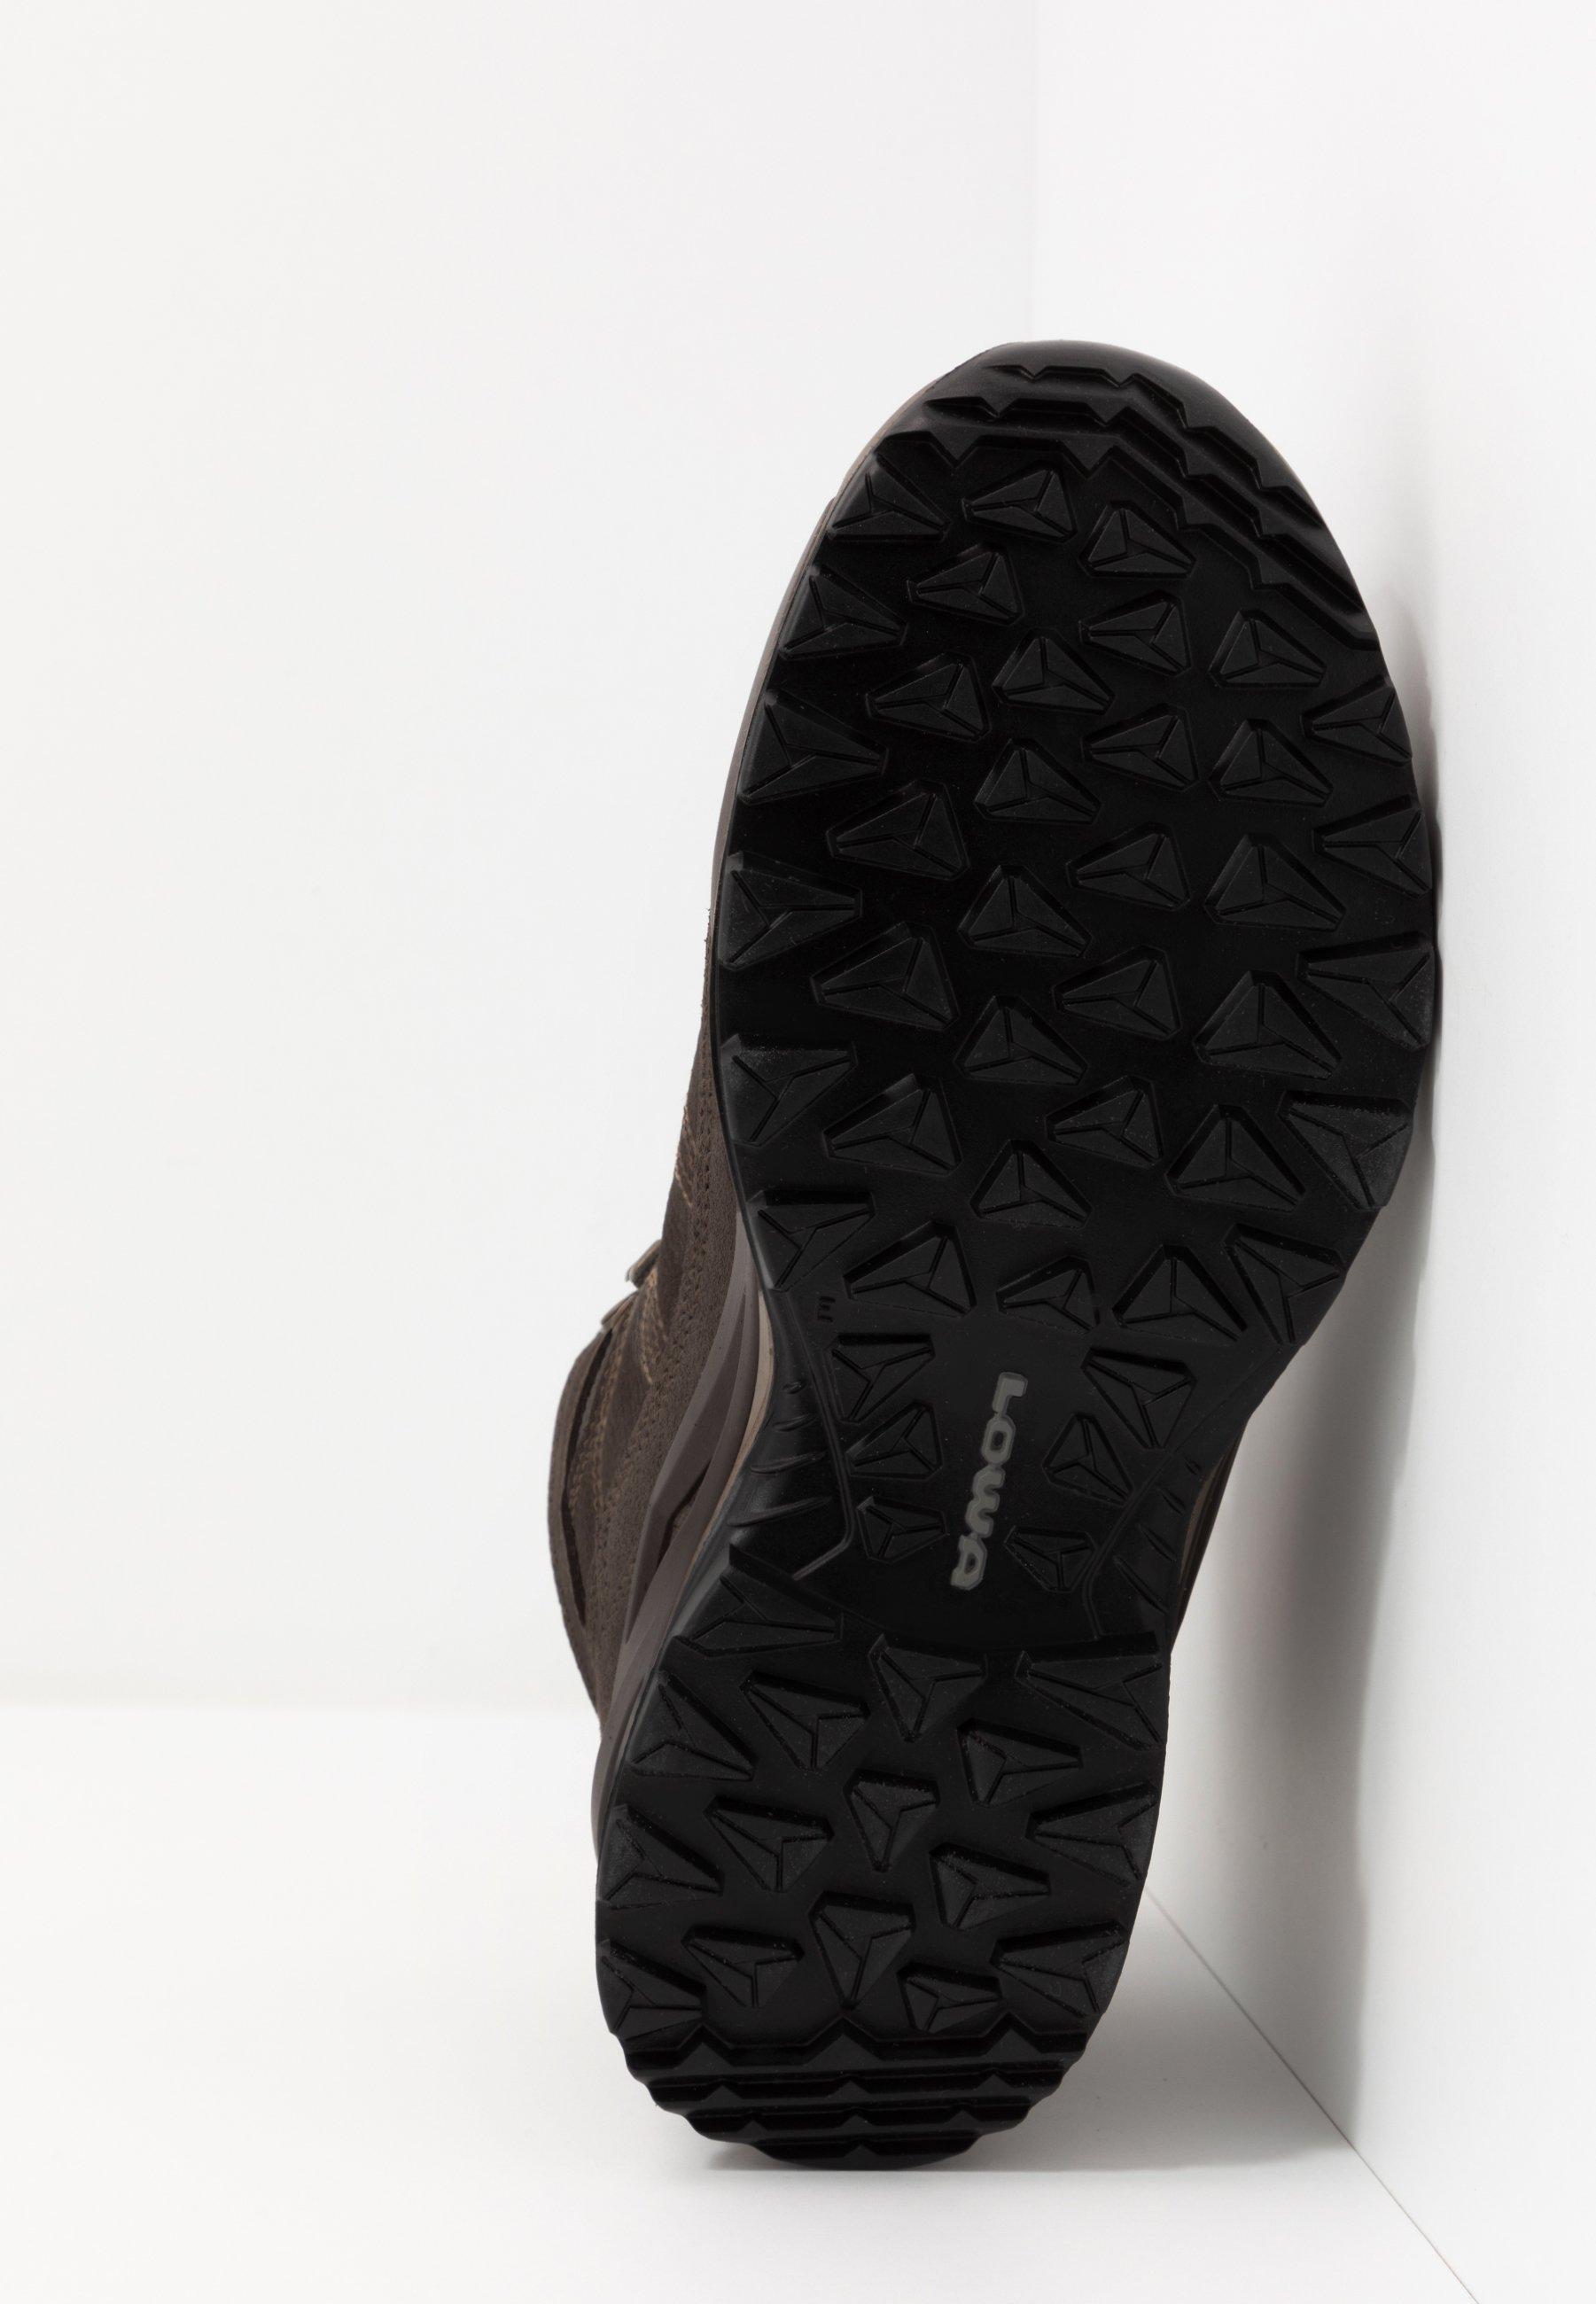 Lowa TORO EVO MID - Scarpa da hiking - dunkelbraun/taupe | Scarpe A Buon Mercato